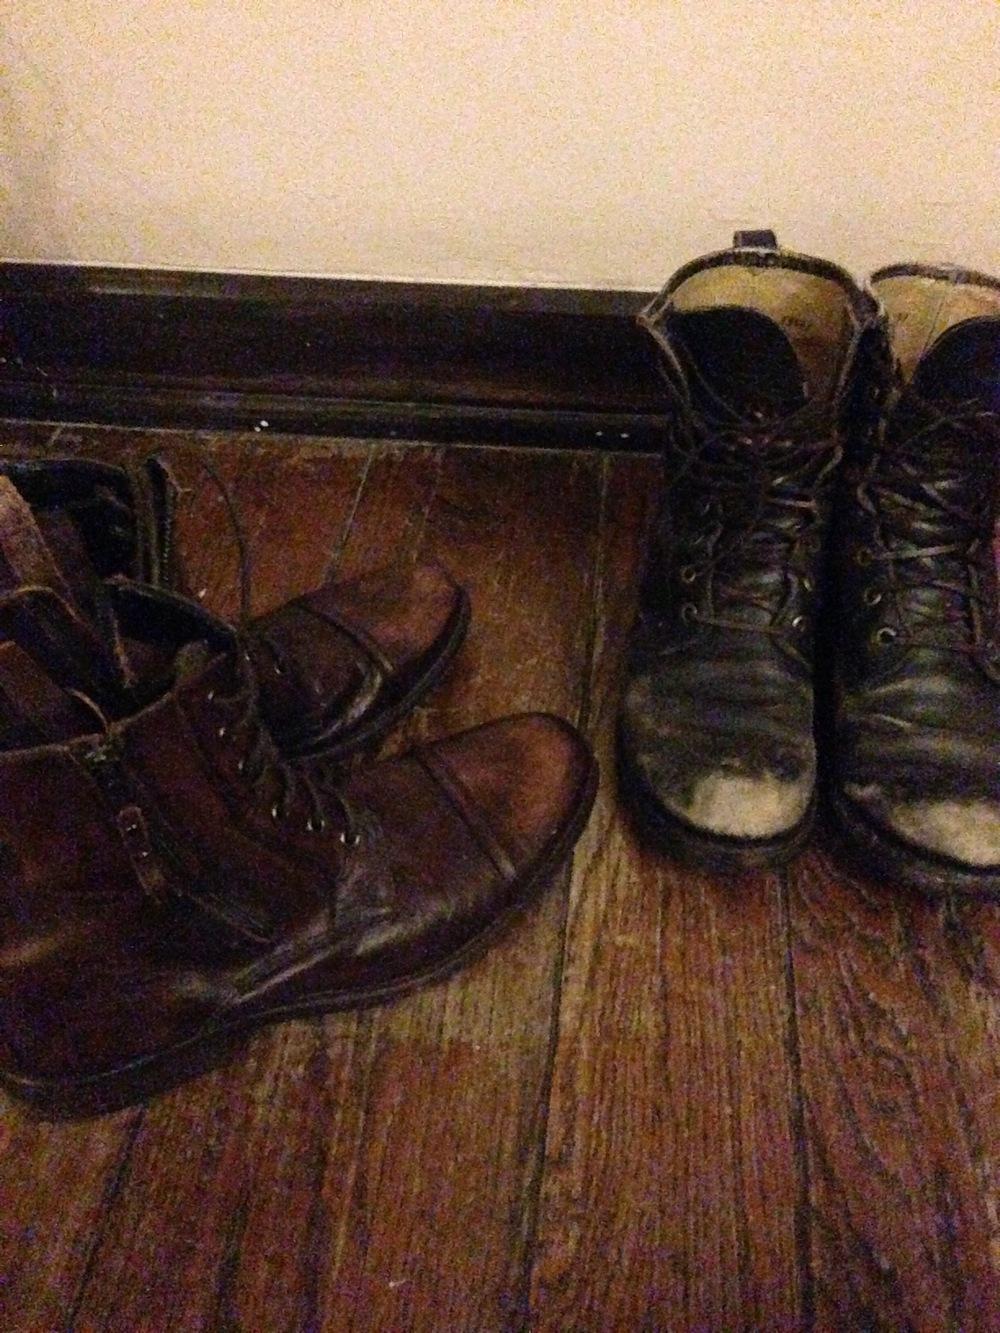 I love boots...